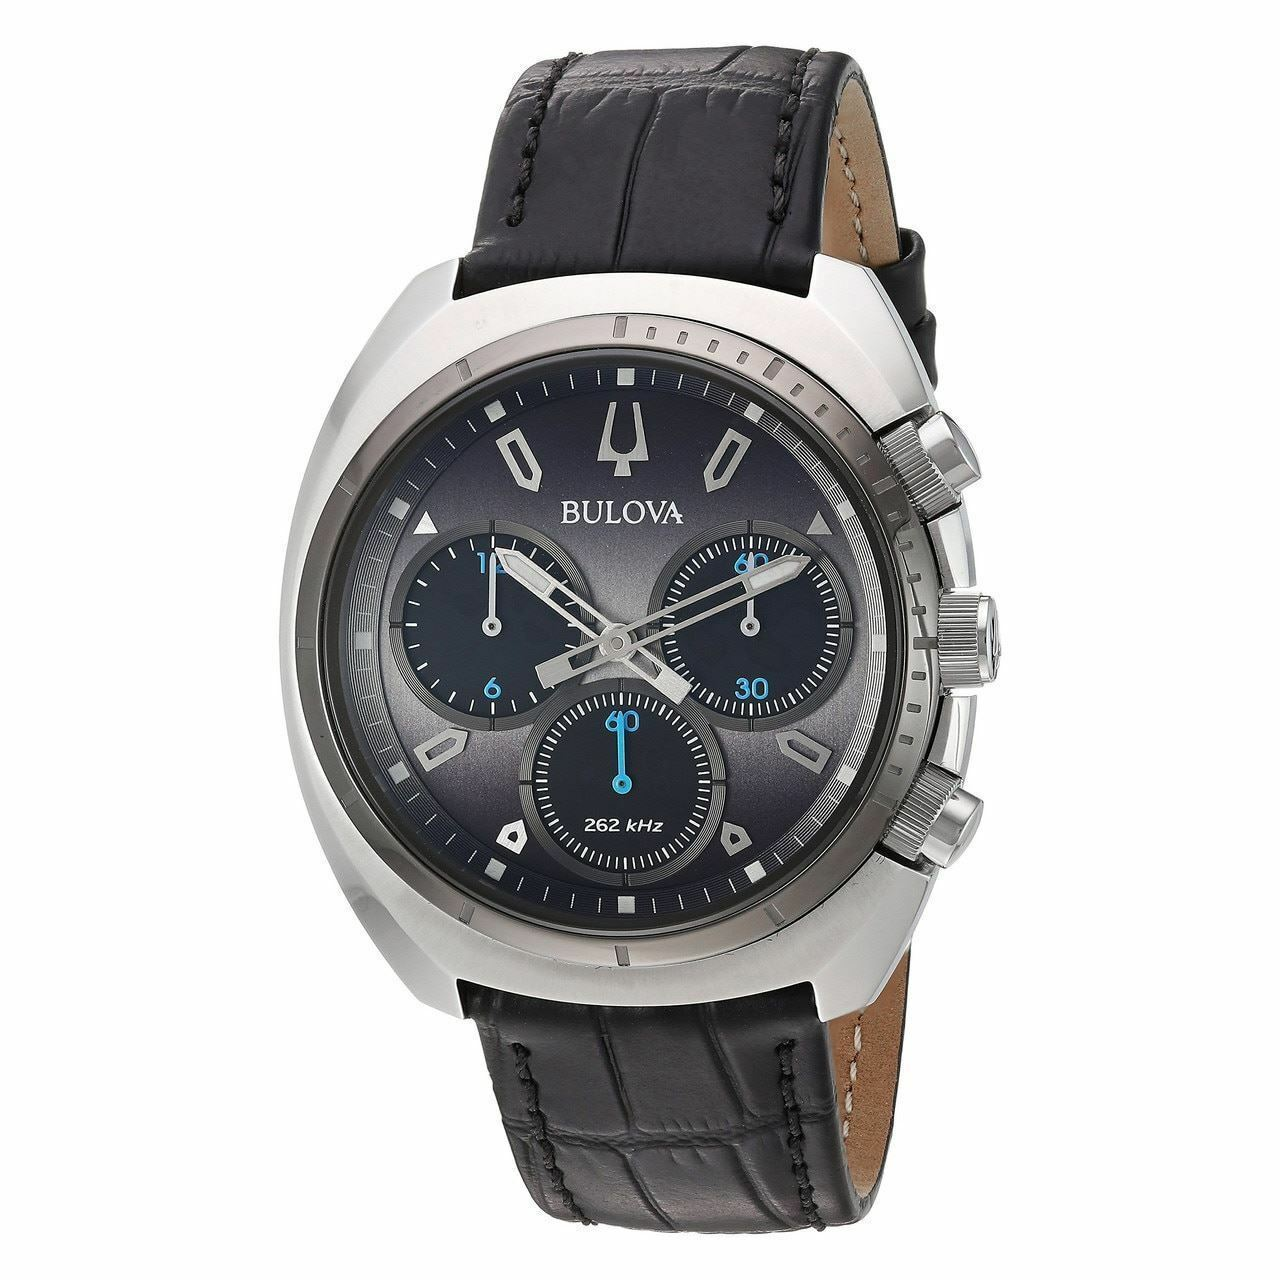 Bulova Men's Chronograph Curv Black Leather Strap Watch 43mm